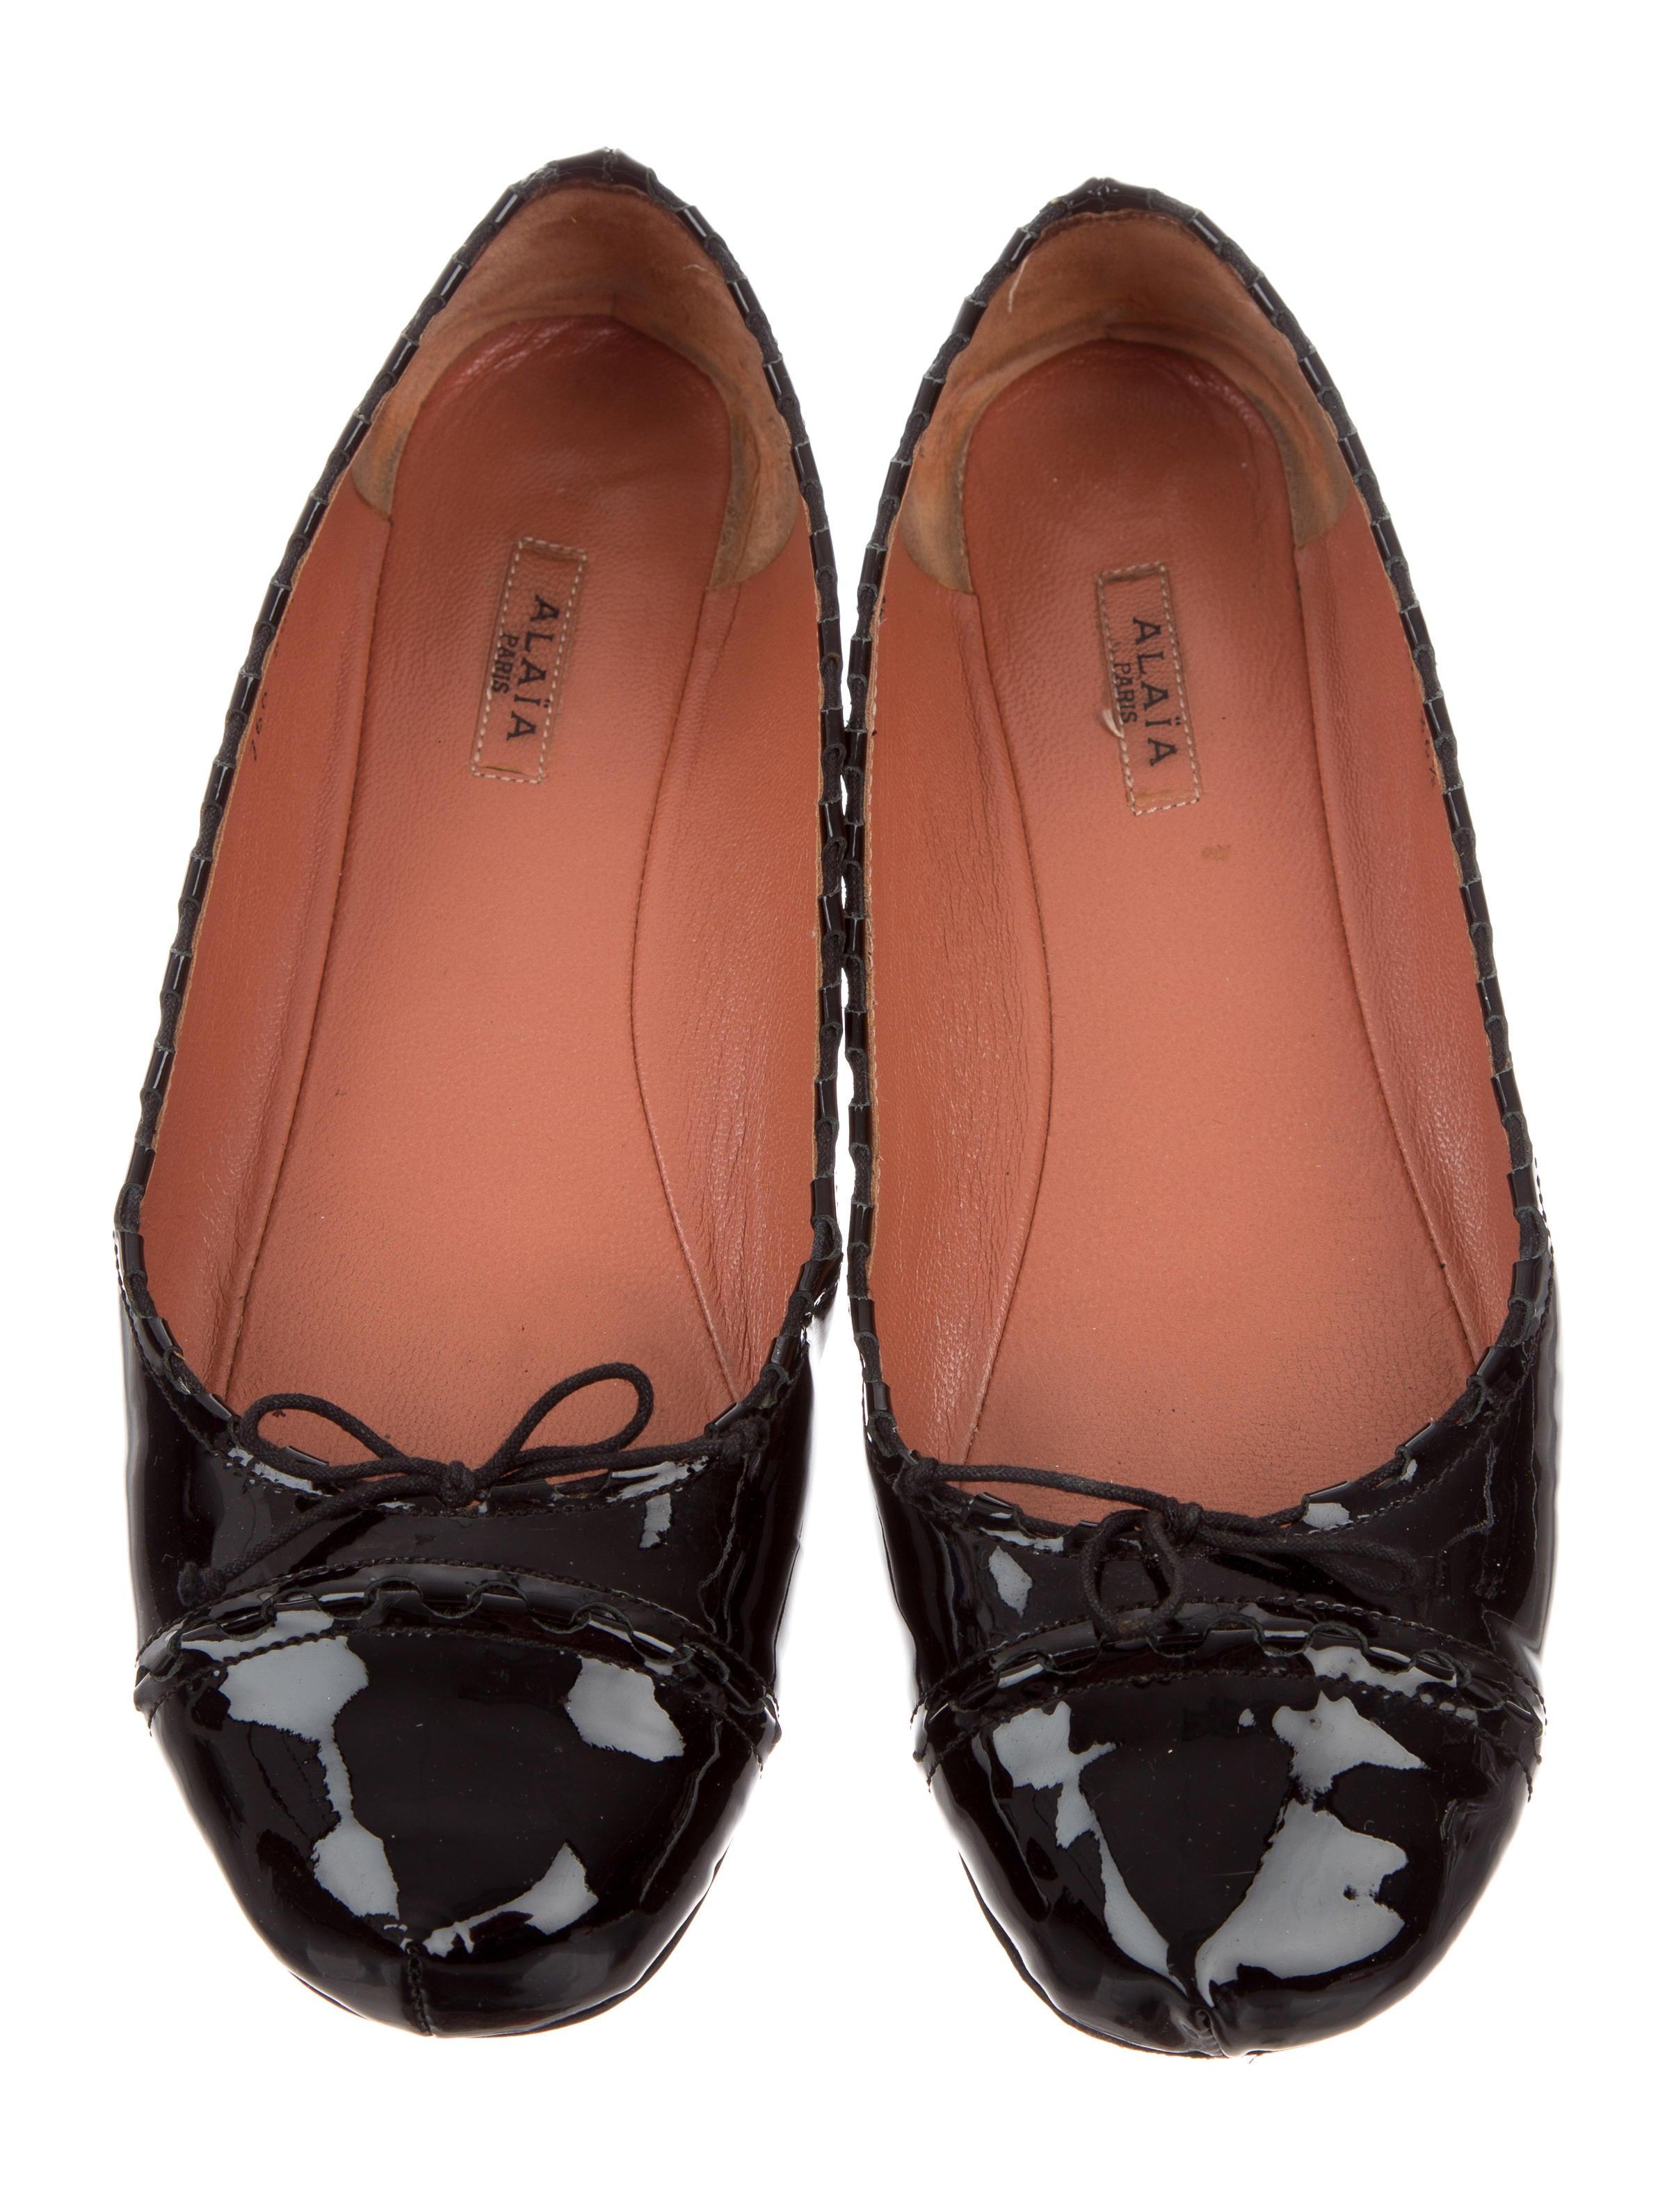 Alaïa Patent Leather Round-Toe Flats free shipping clearance CuRb8ZgqKQ